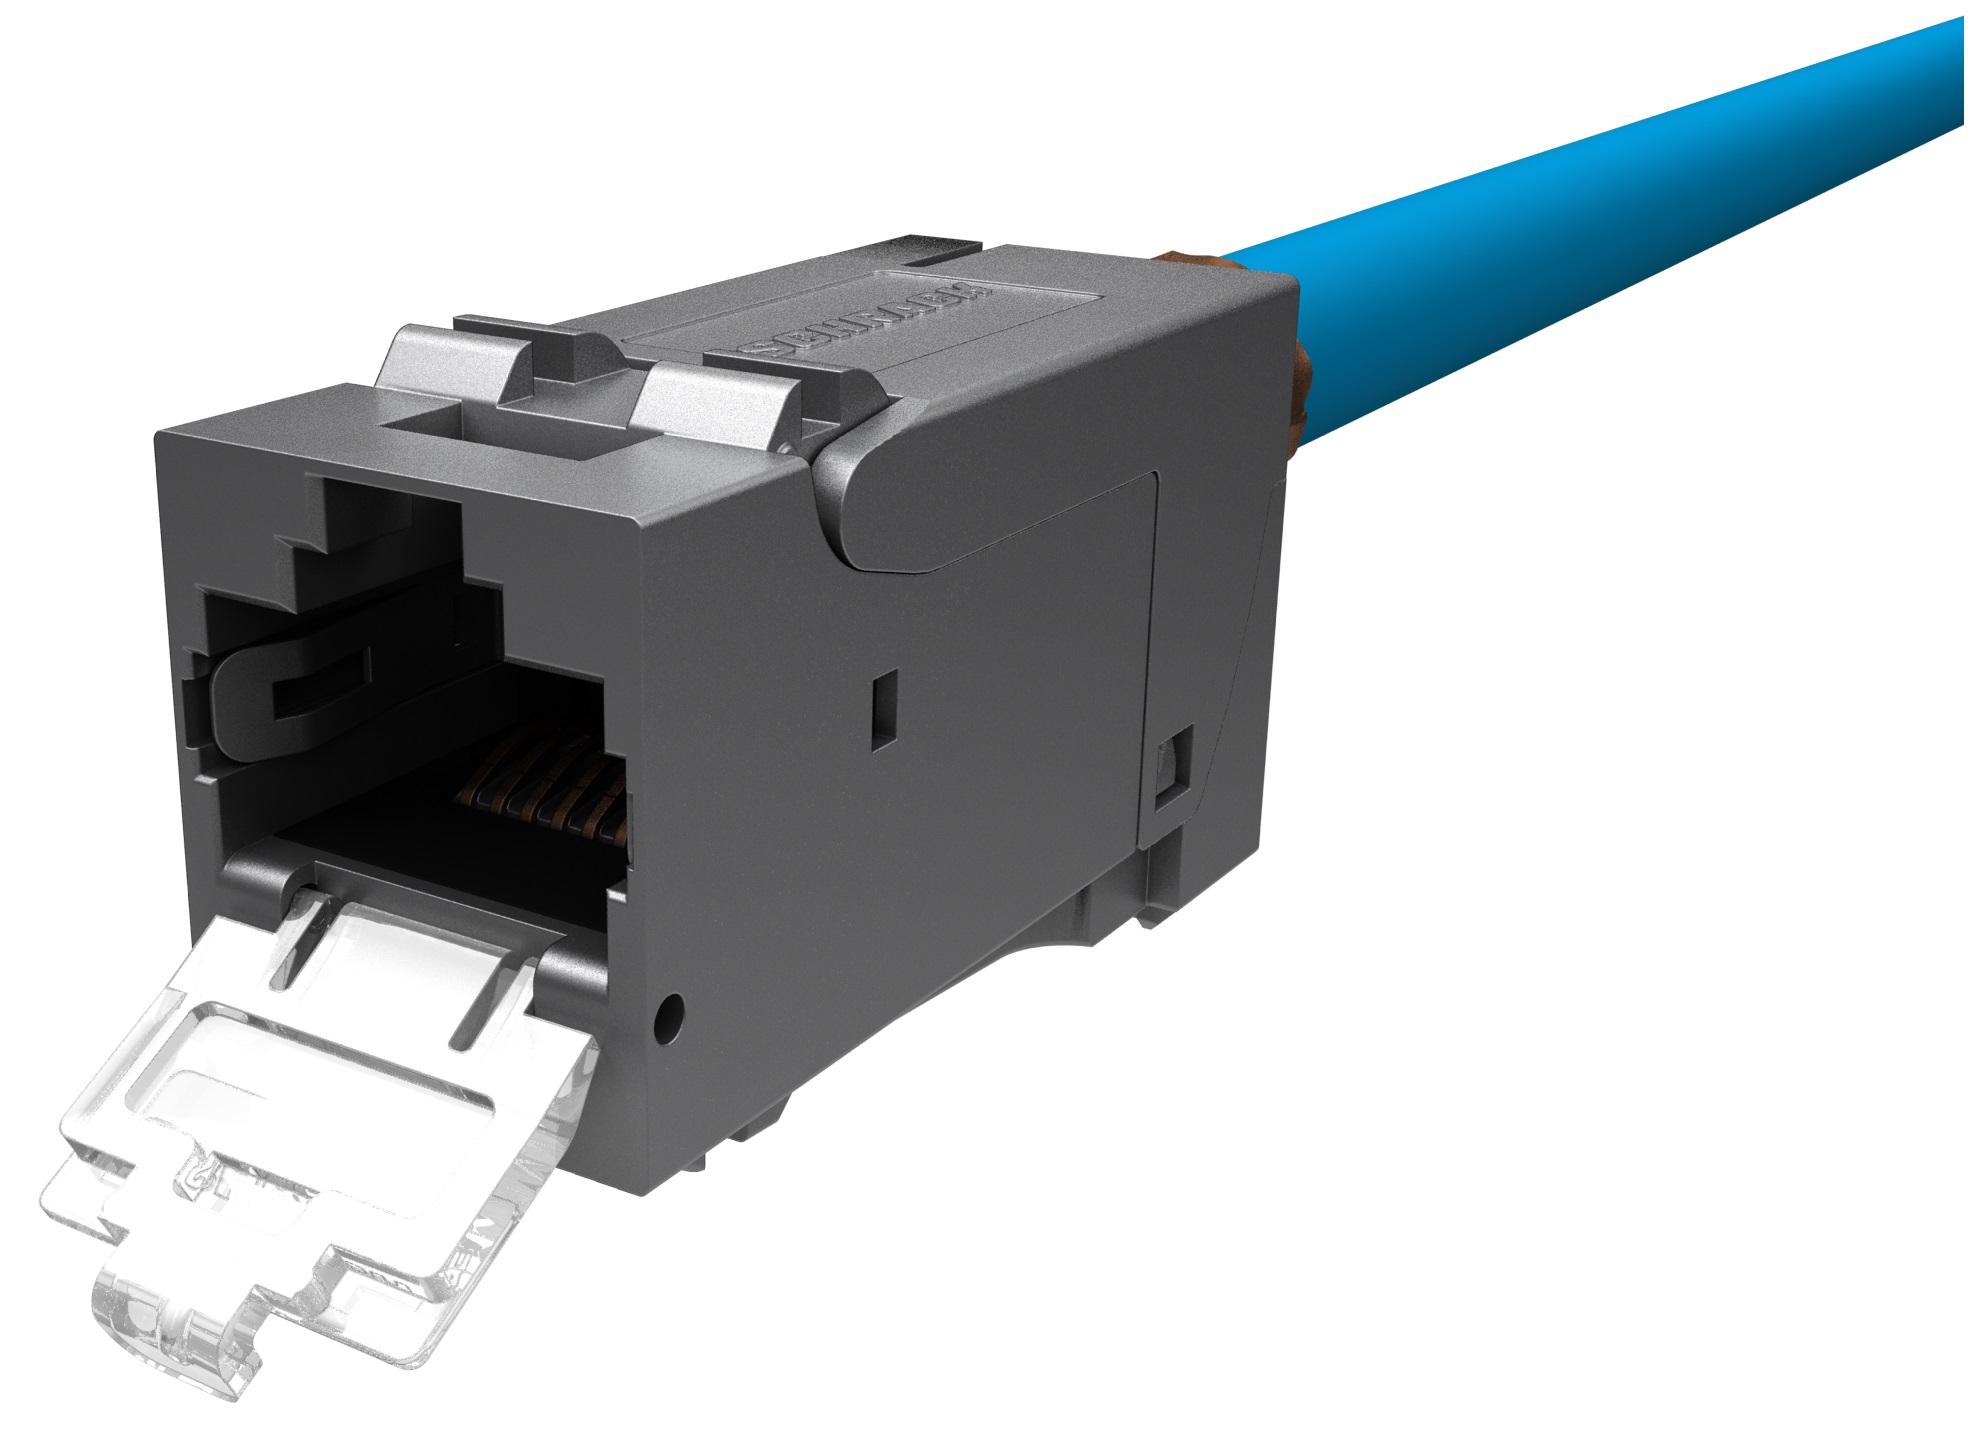 1 VE PERFORMANCE LINE Buchse RJ45 geschirmt Klasse Ea 10GB PoE+ HSPMRJ6G2T